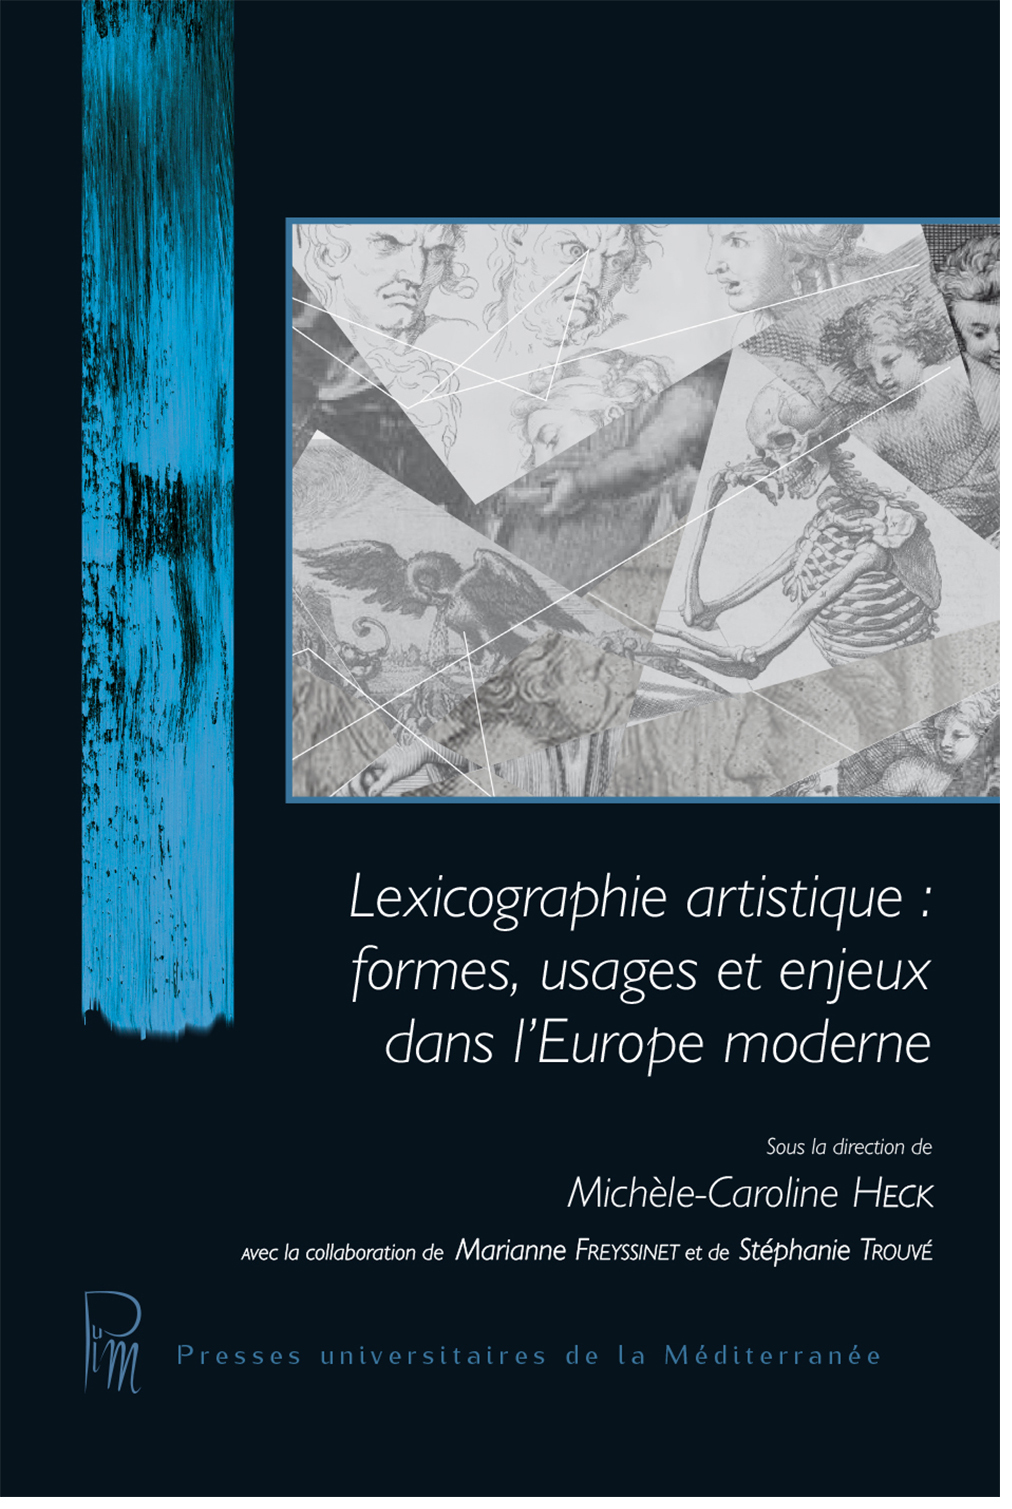 LEXICOGRAPHIE ARTISTIQUE : FORMES, USAGES ET ENJEUX DANS L'EUROPE MODERNE